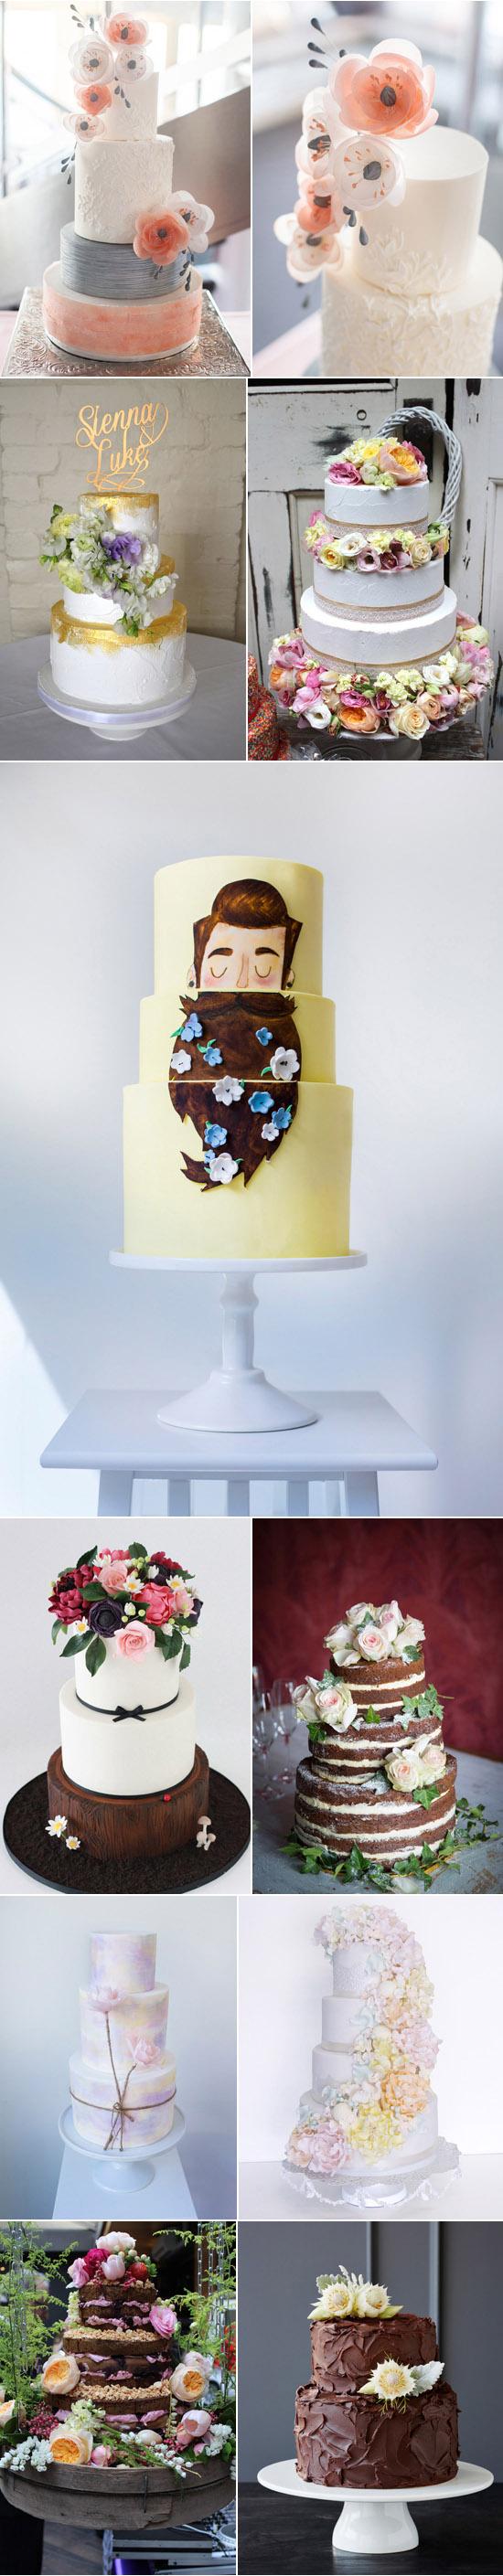 Spring inspired wedding cakes